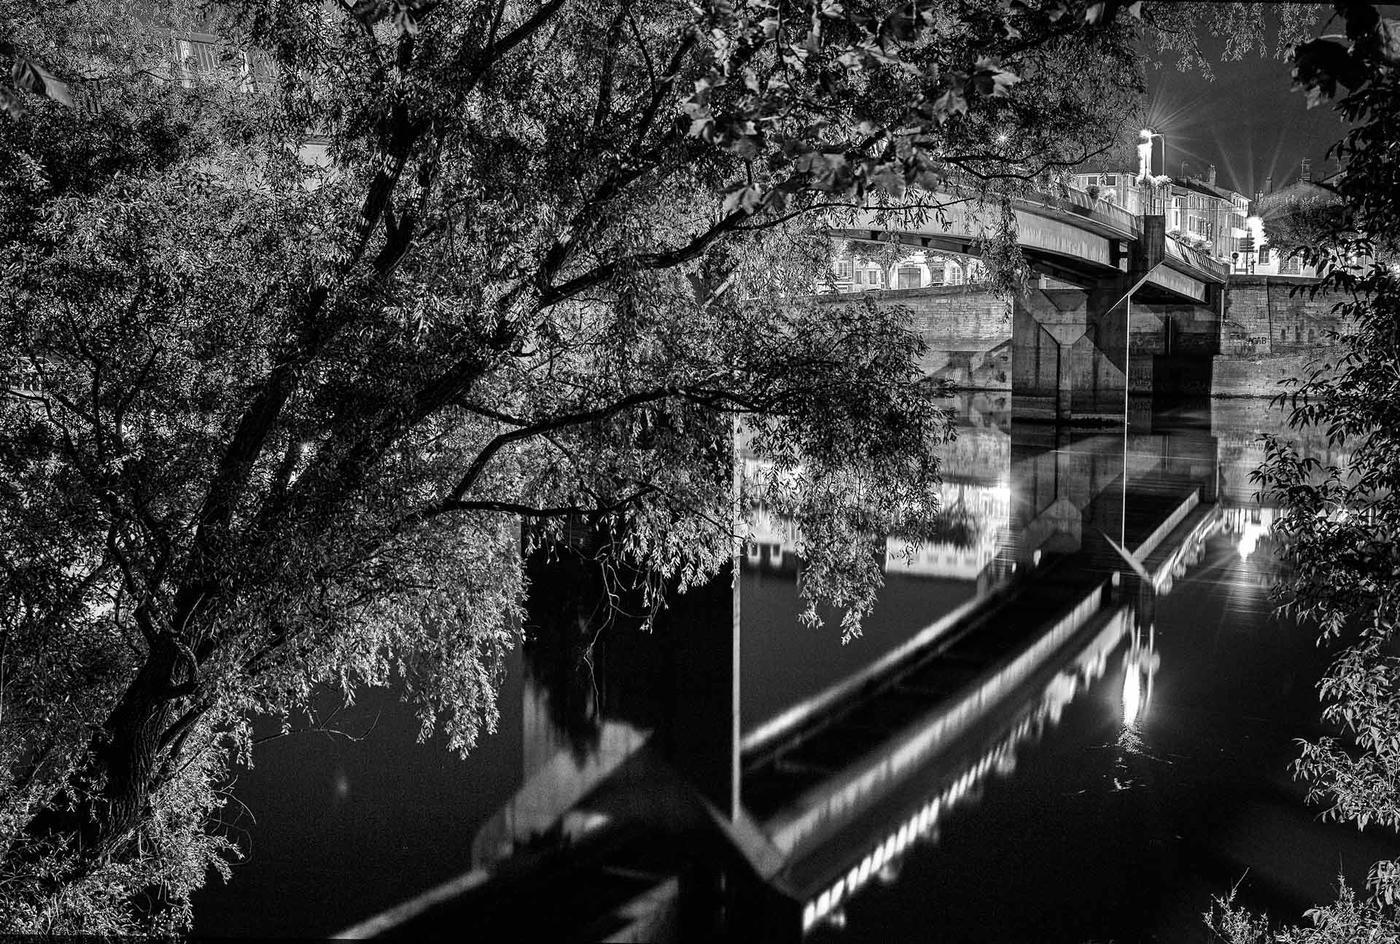 puente de Tournus (Jose Luis Rubio Perez)